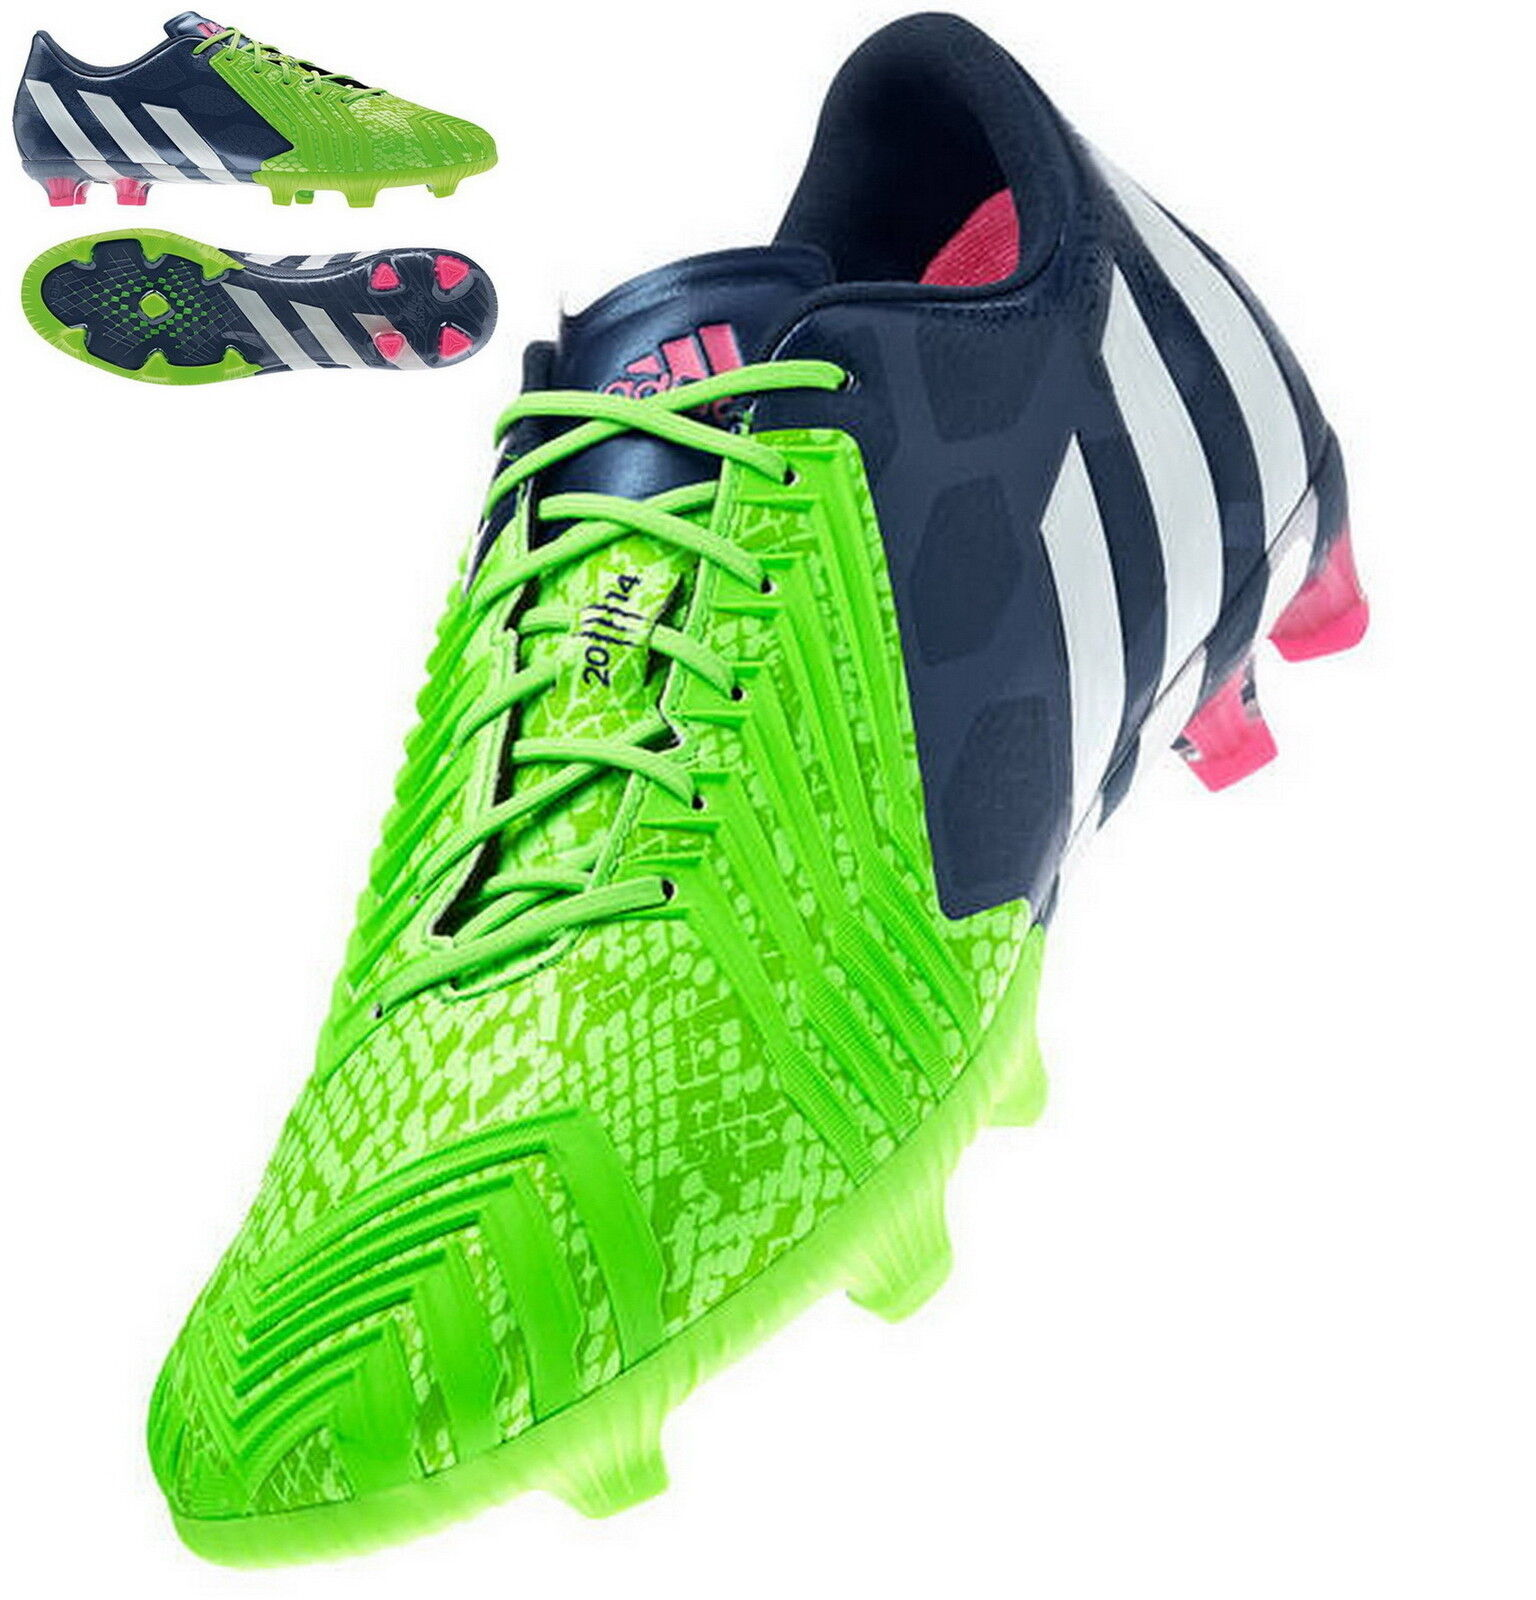 Adidas Protator Instinct Instinct Instinct FG Fußballschuhe Nocken M17644 c9d6e1